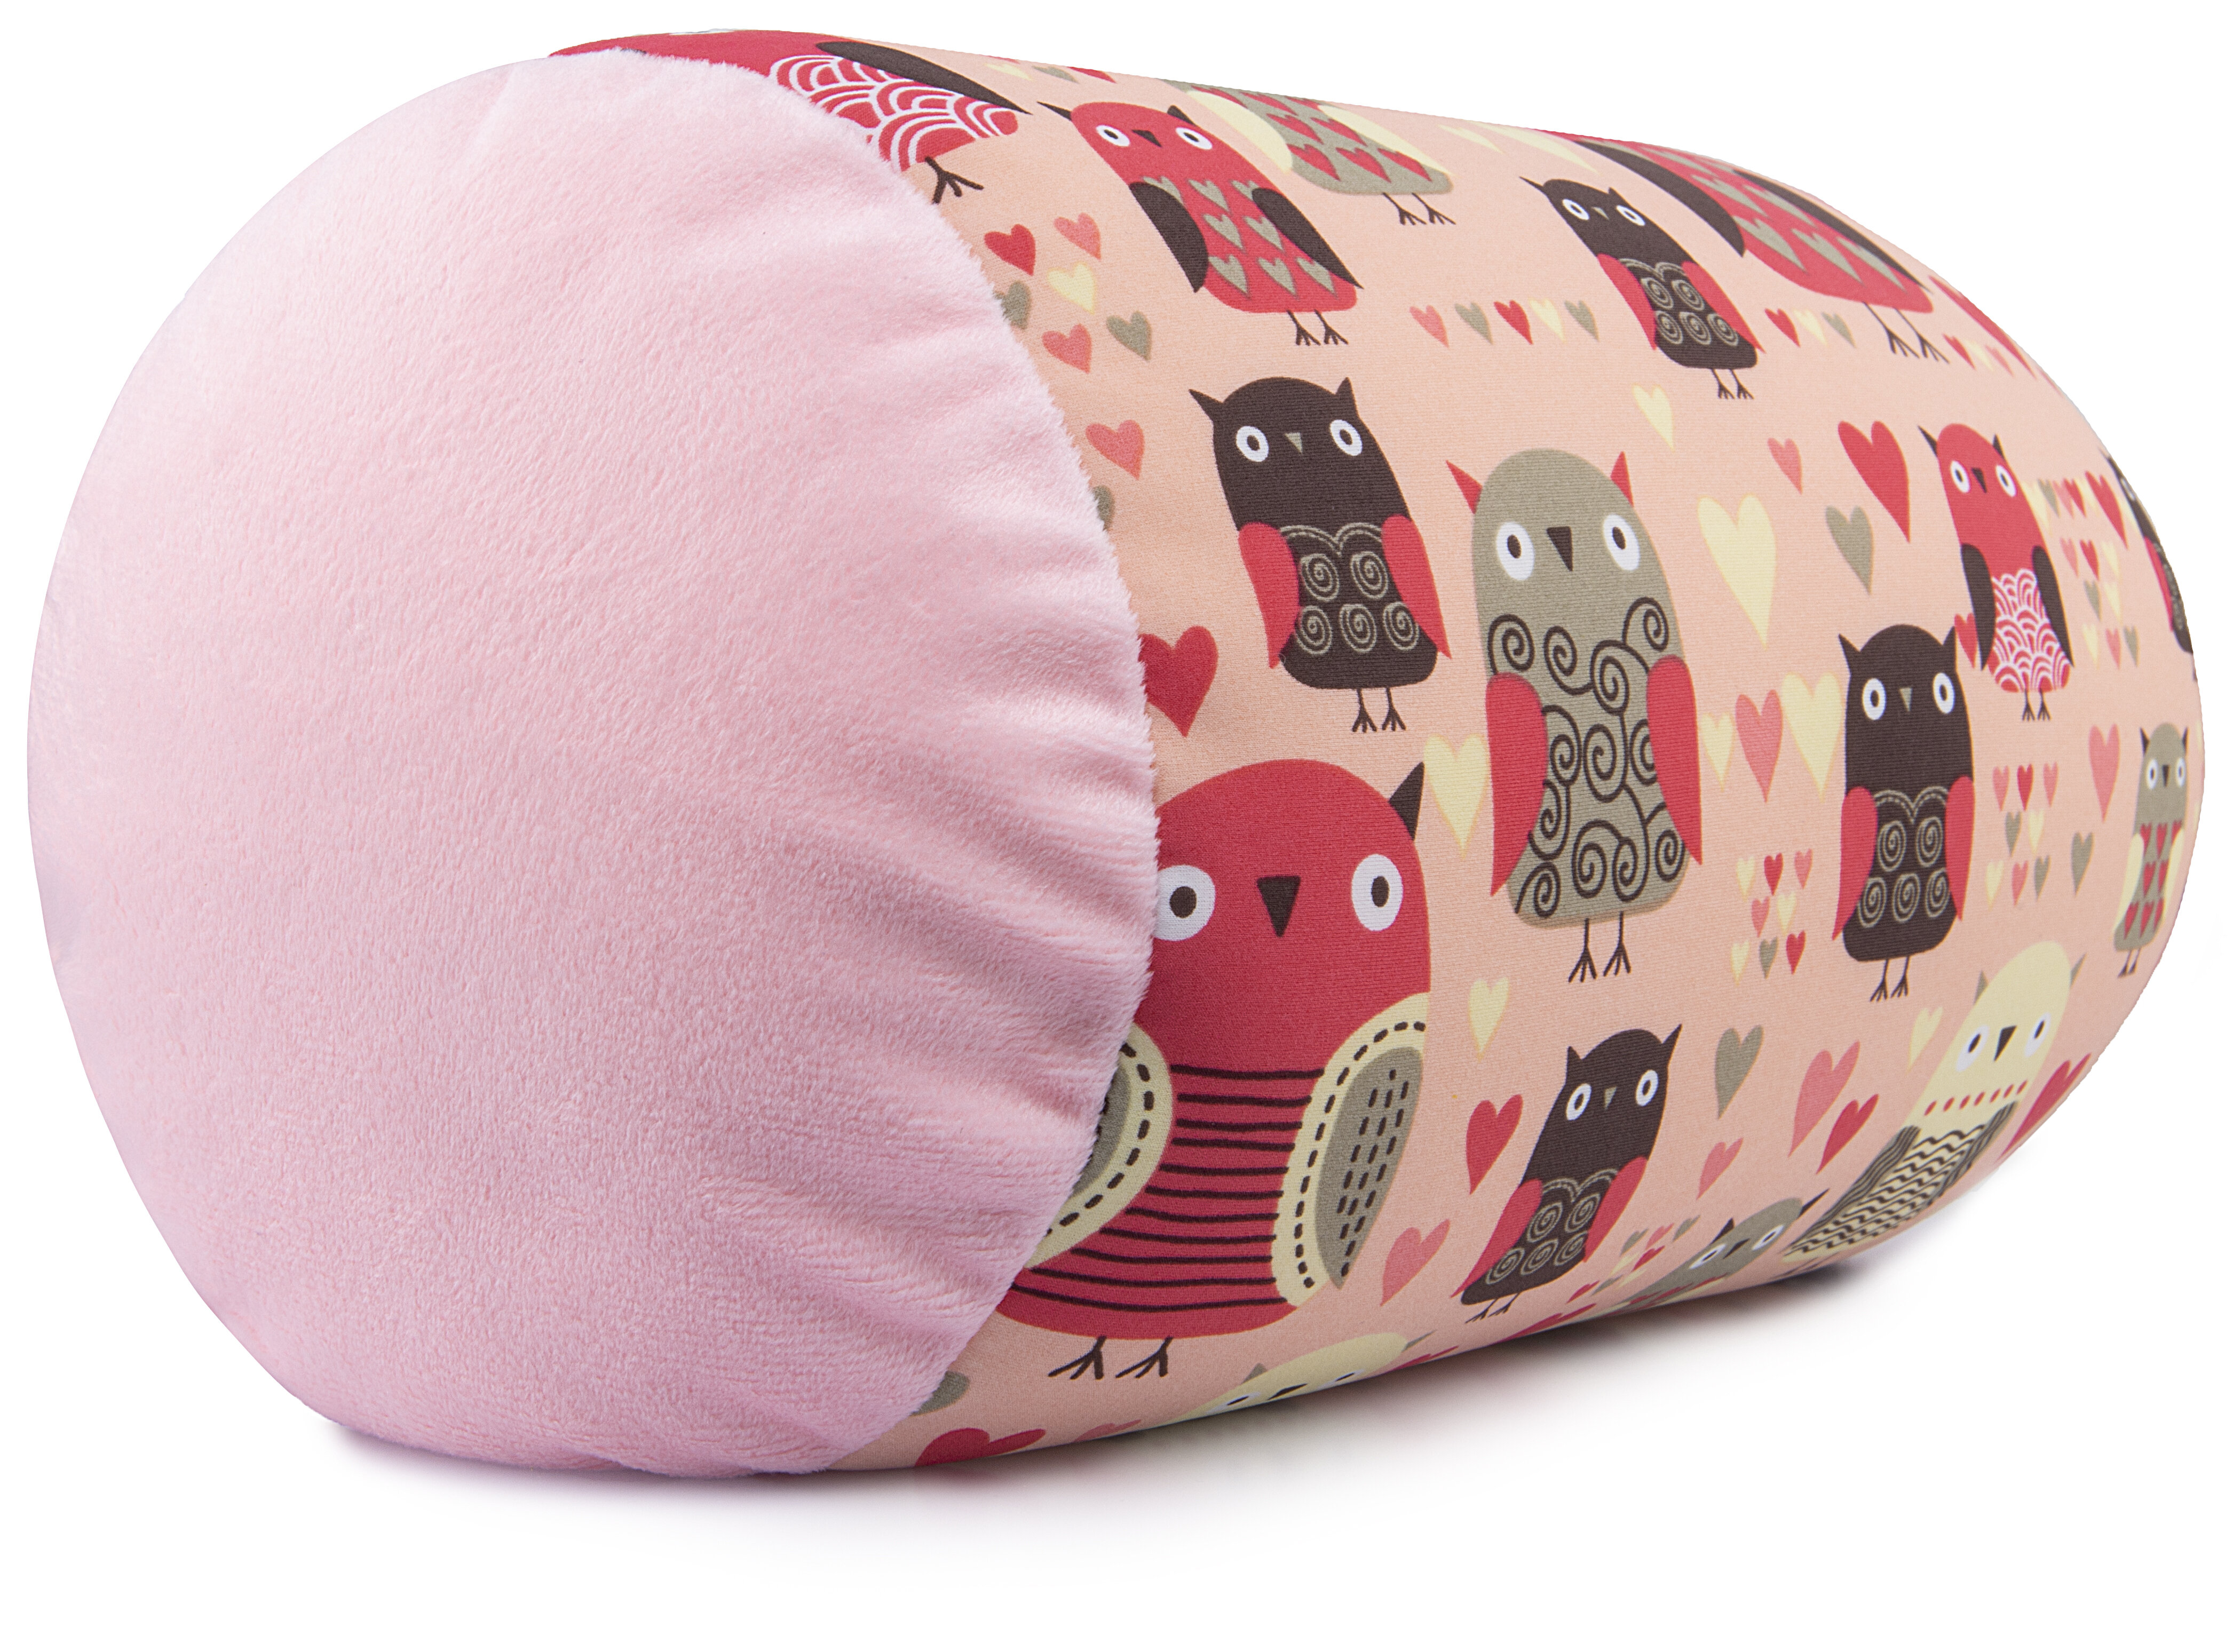 Stupendous Dacheng Squish Microbead Bolster Pillow Creativecarmelina Interior Chair Design Creativecarmelinacom